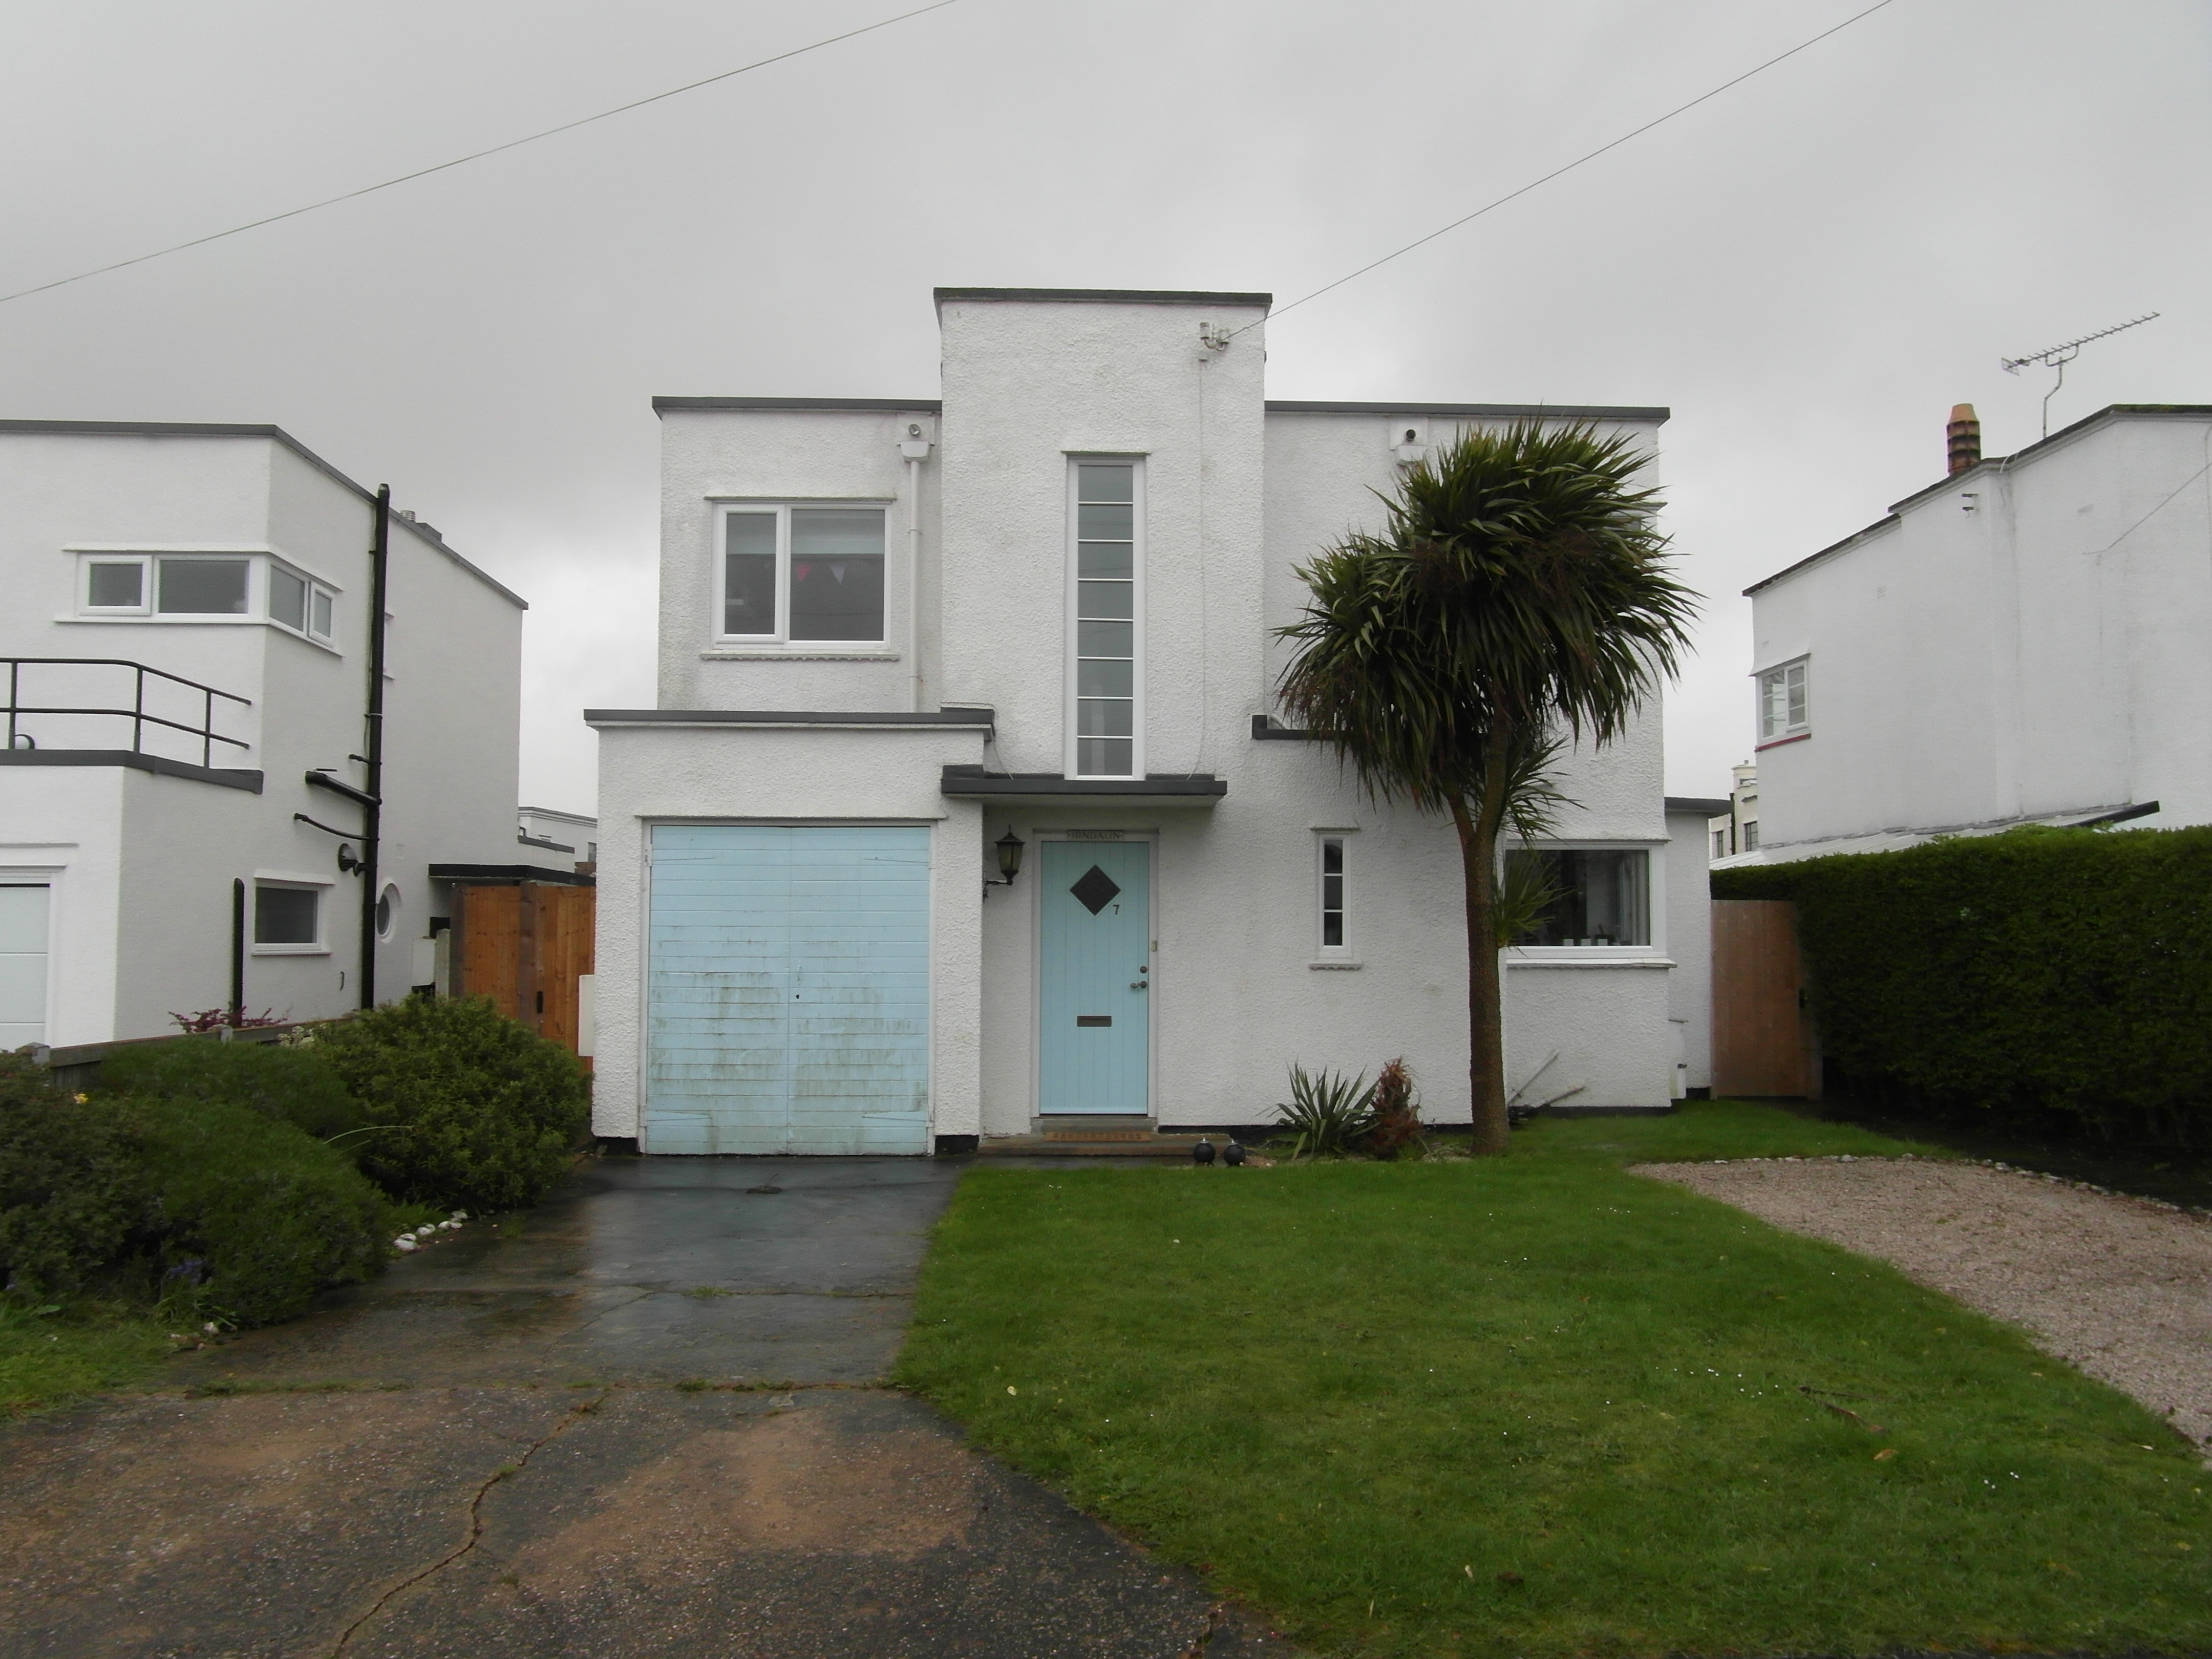 House on the Frinton Park Estate Frinton-on-sea